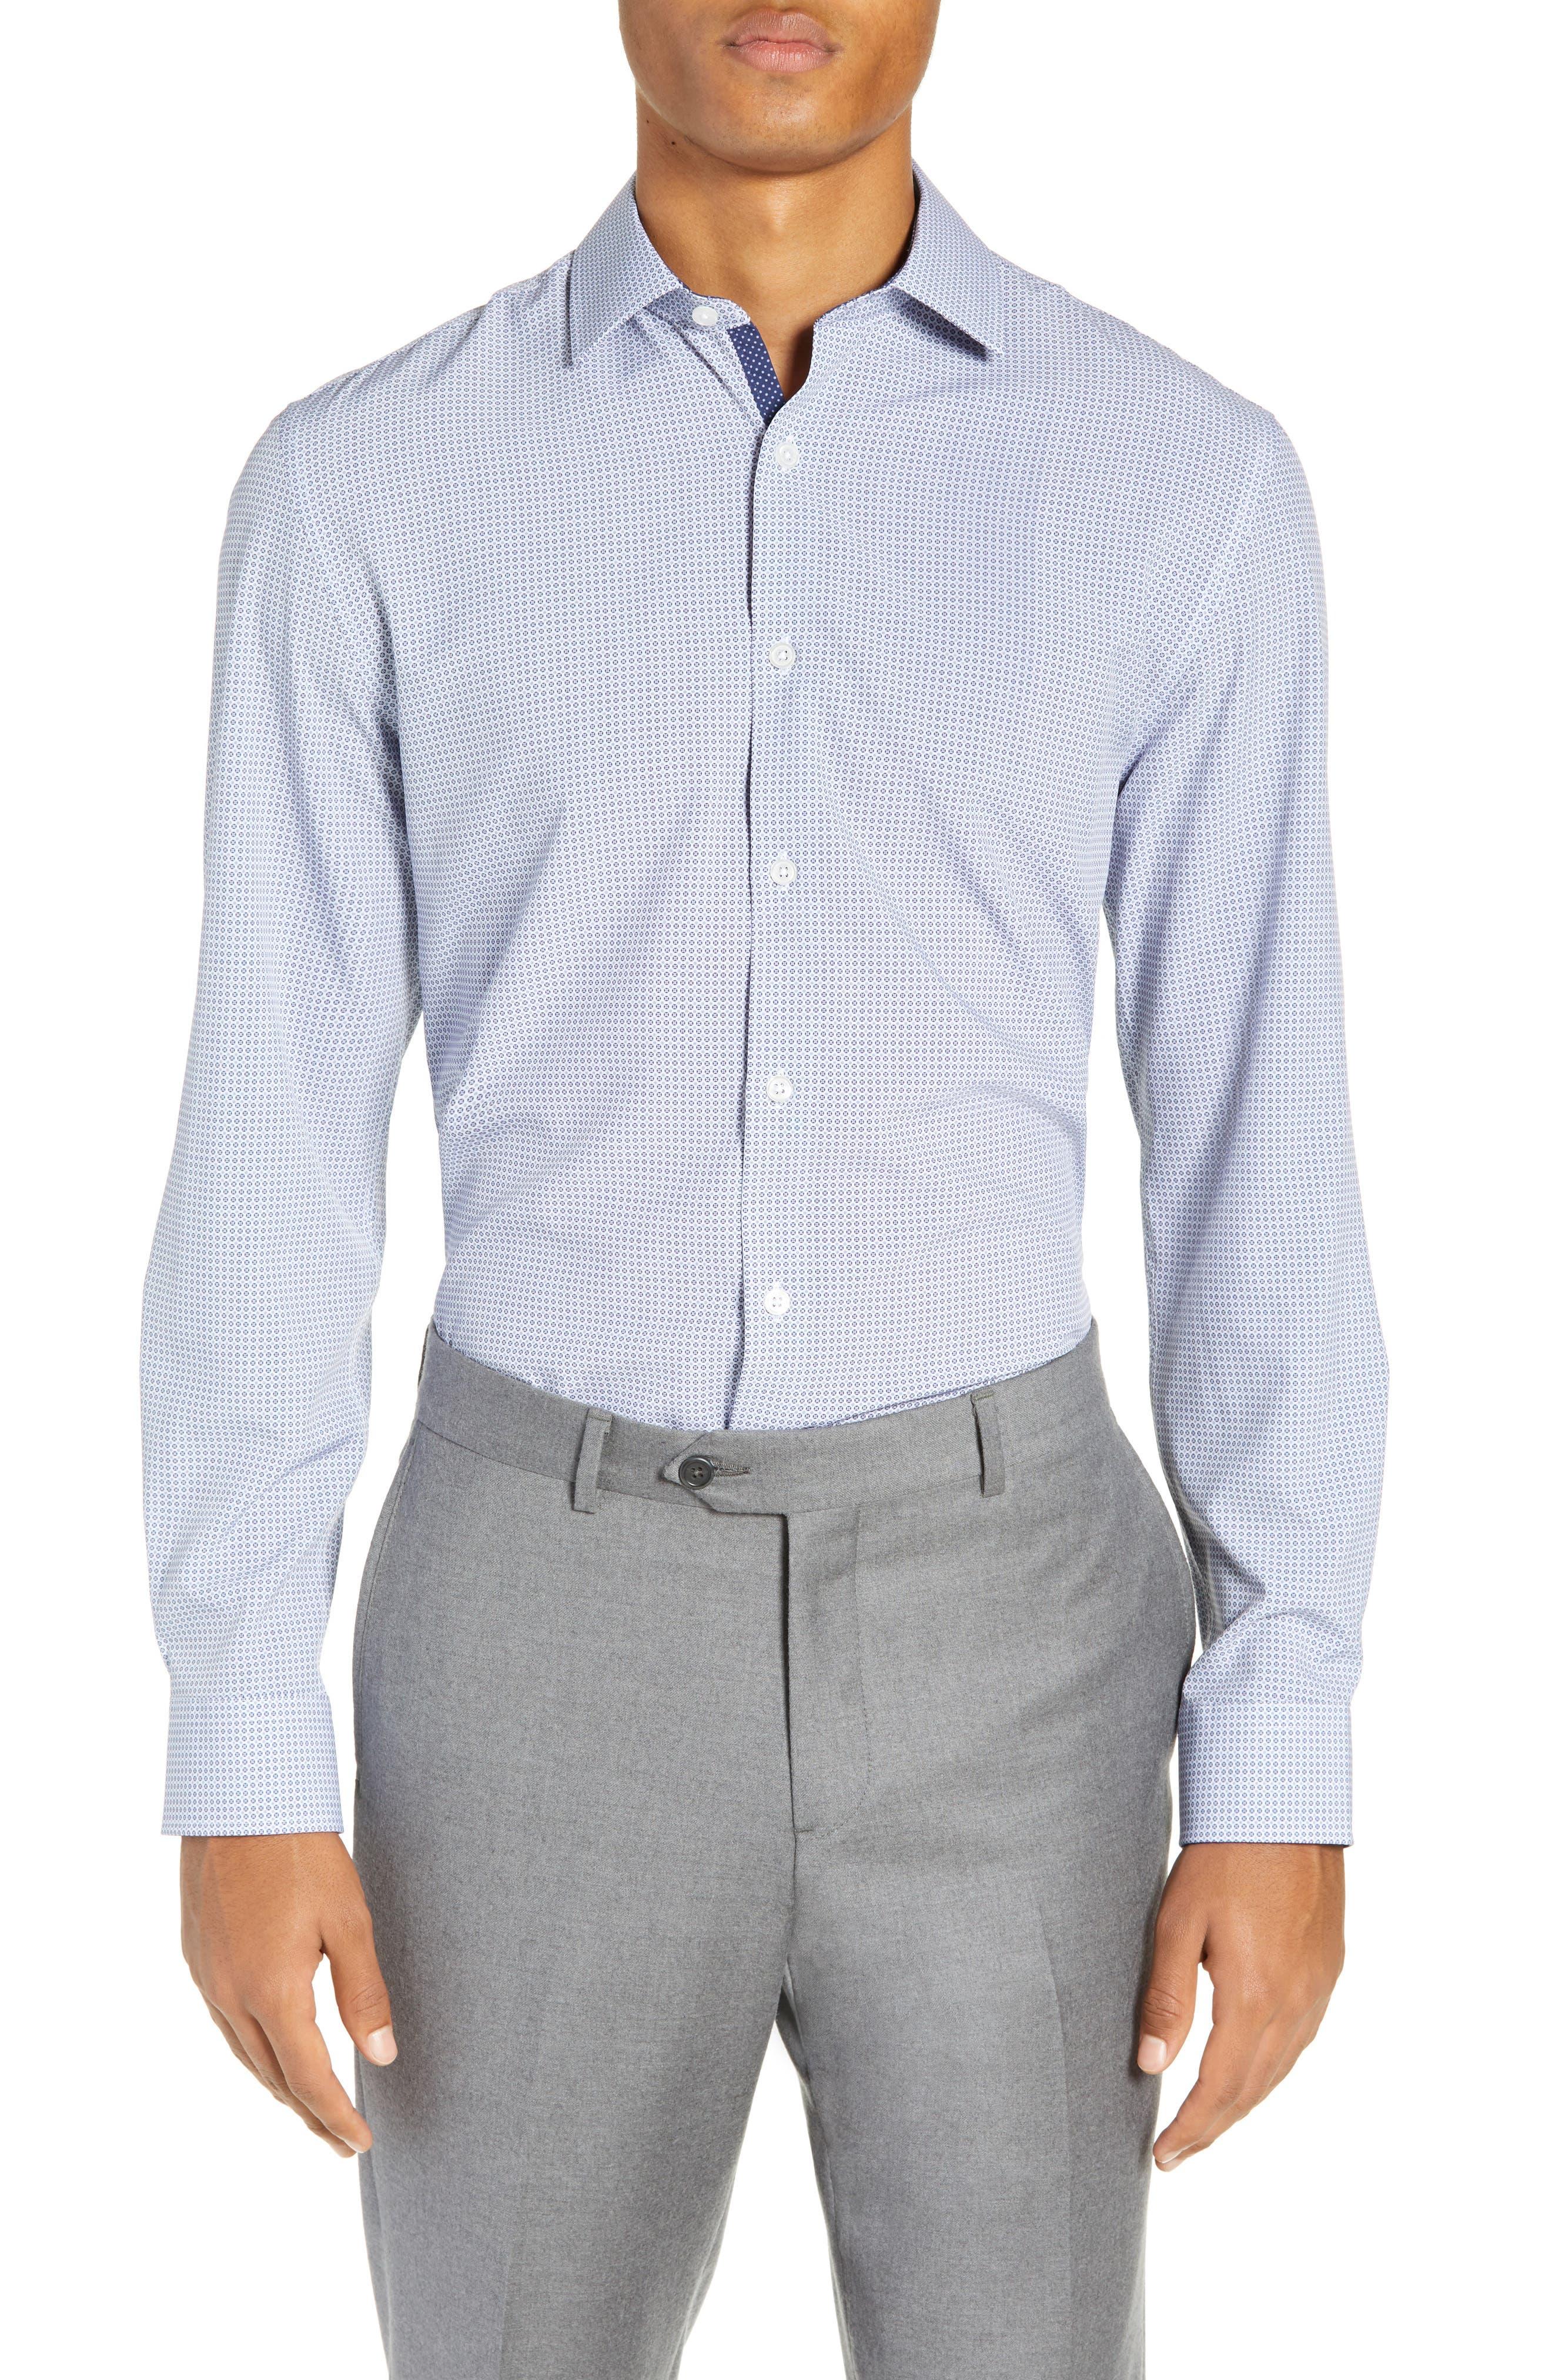 Trim Fit 4-Way Stretch Geometric Dress Shirt, Main, color, 400